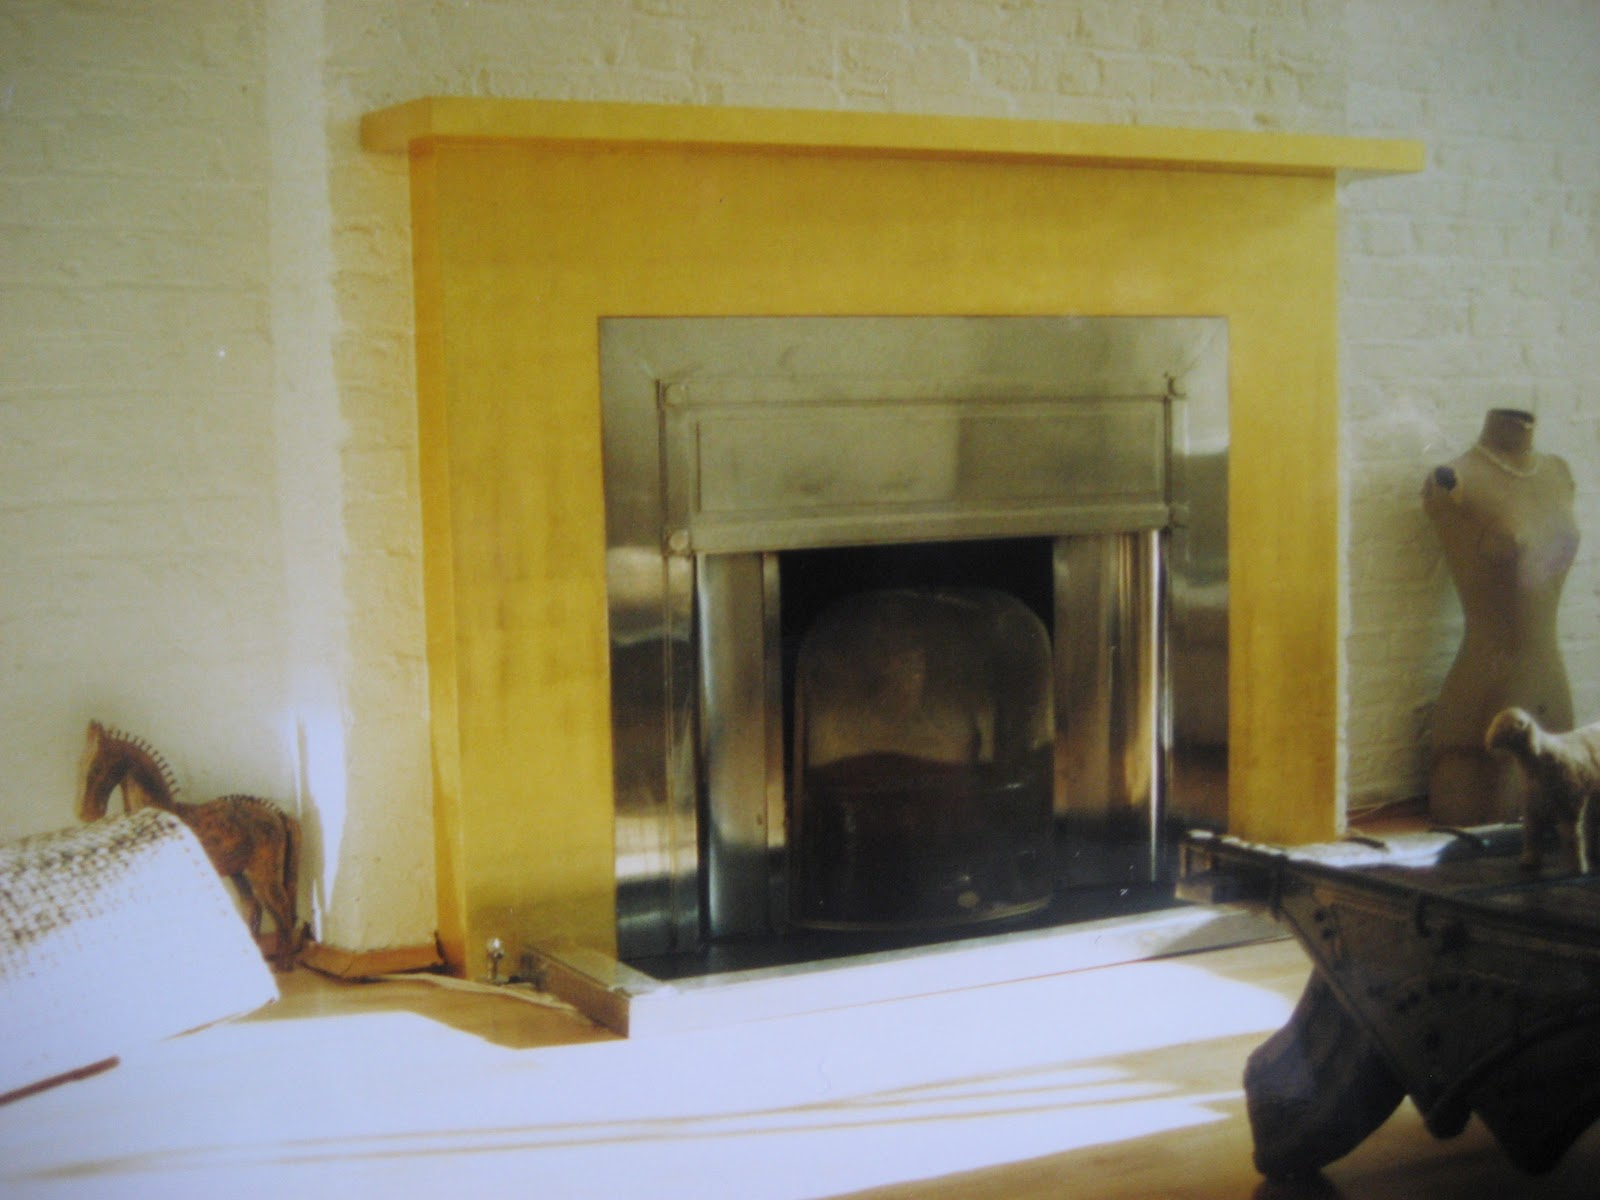 Original Gilding London: Renovate a fireplace in Gold Leaf